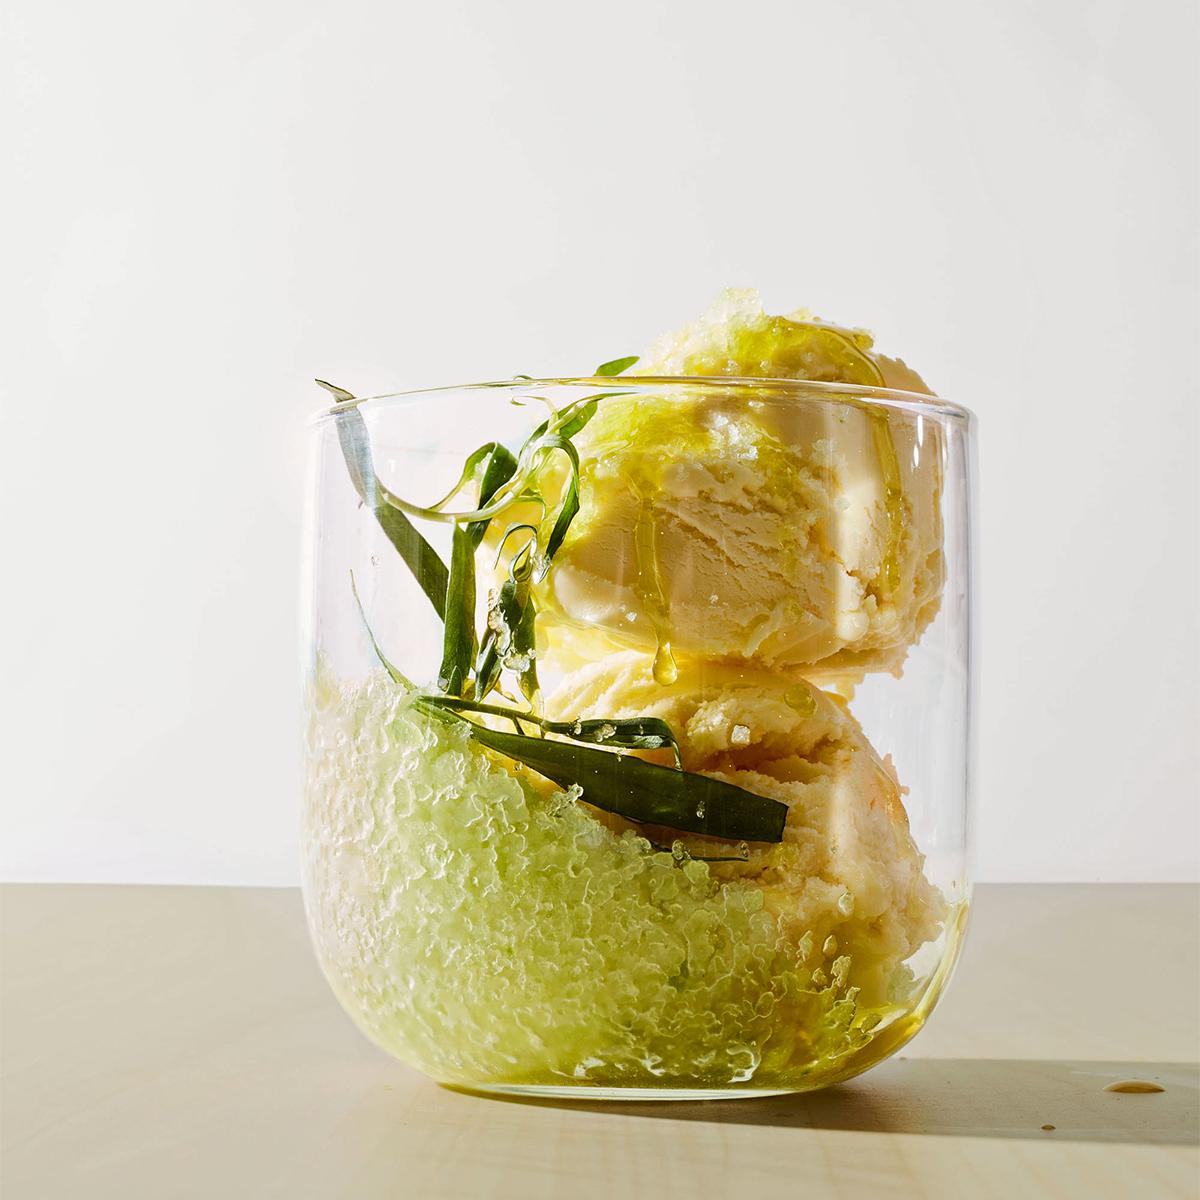 cucumber lime granita with vanilla ice cream and tarragon